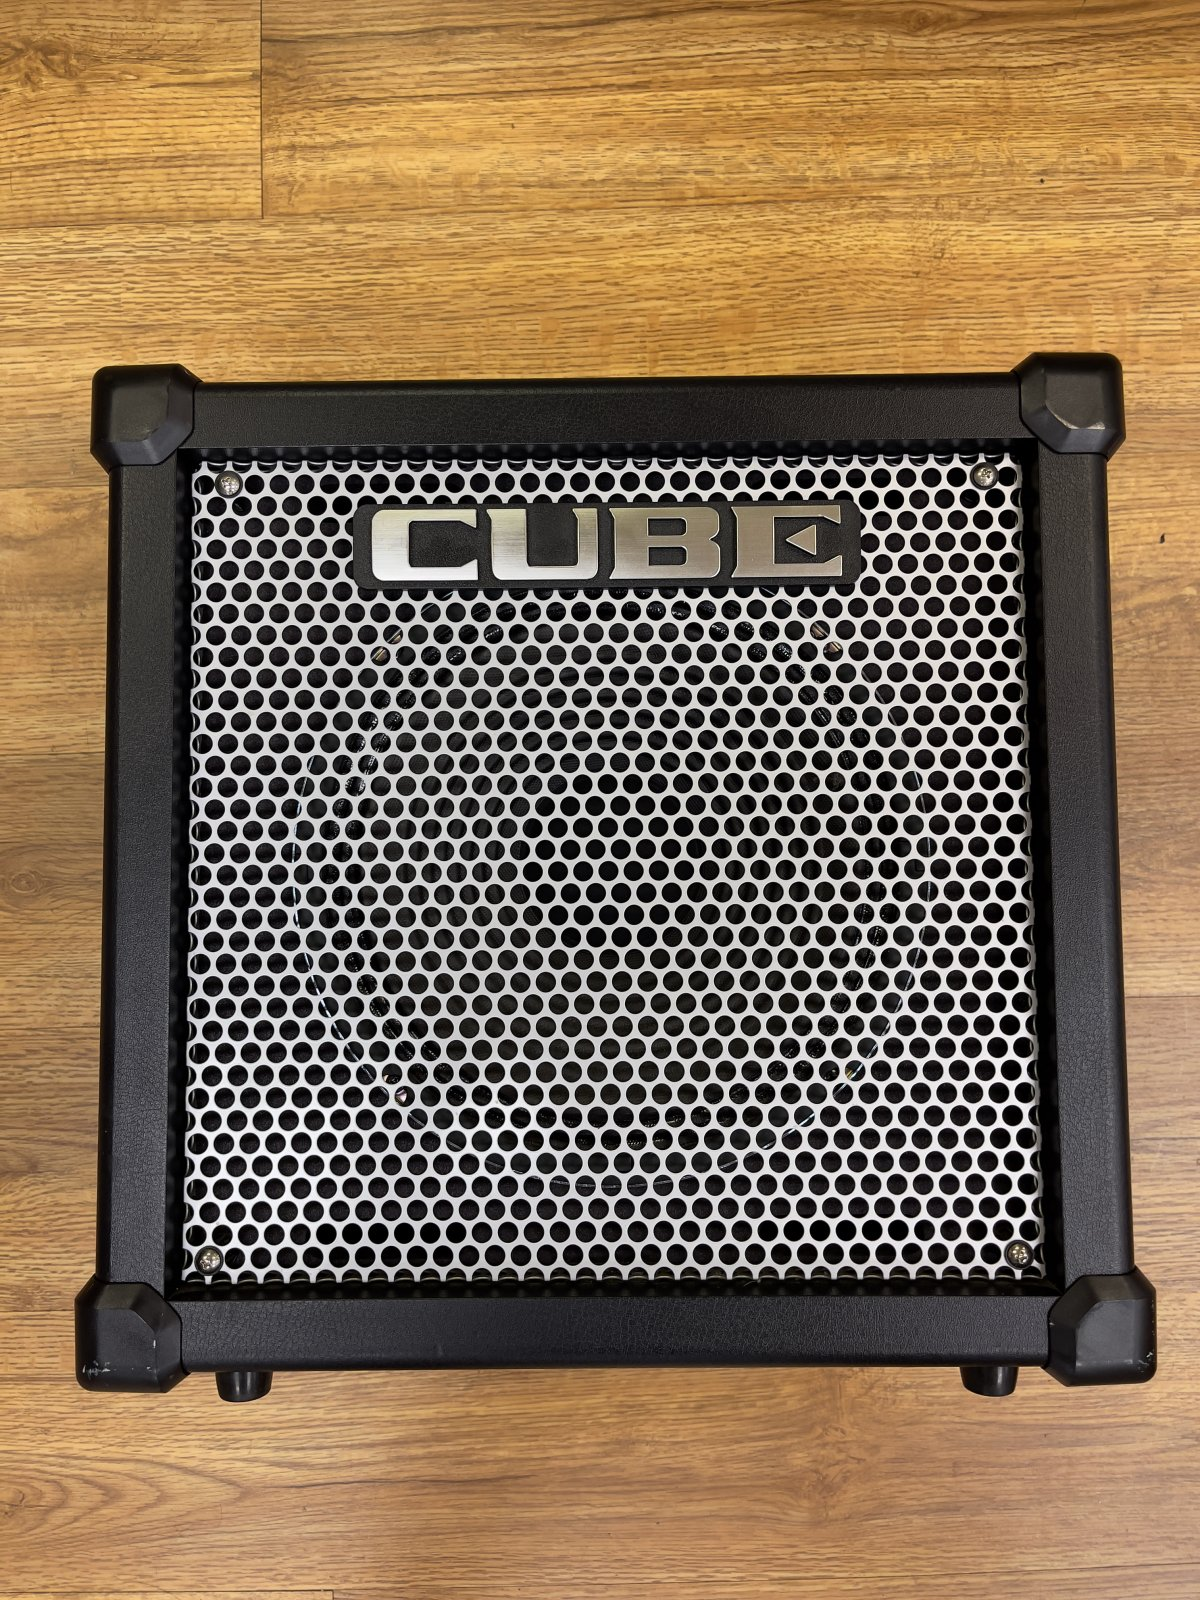 ROLAND CUBE-40GX 40-WATT 1X10 COSM COMBO AMP WITH FX (USED)